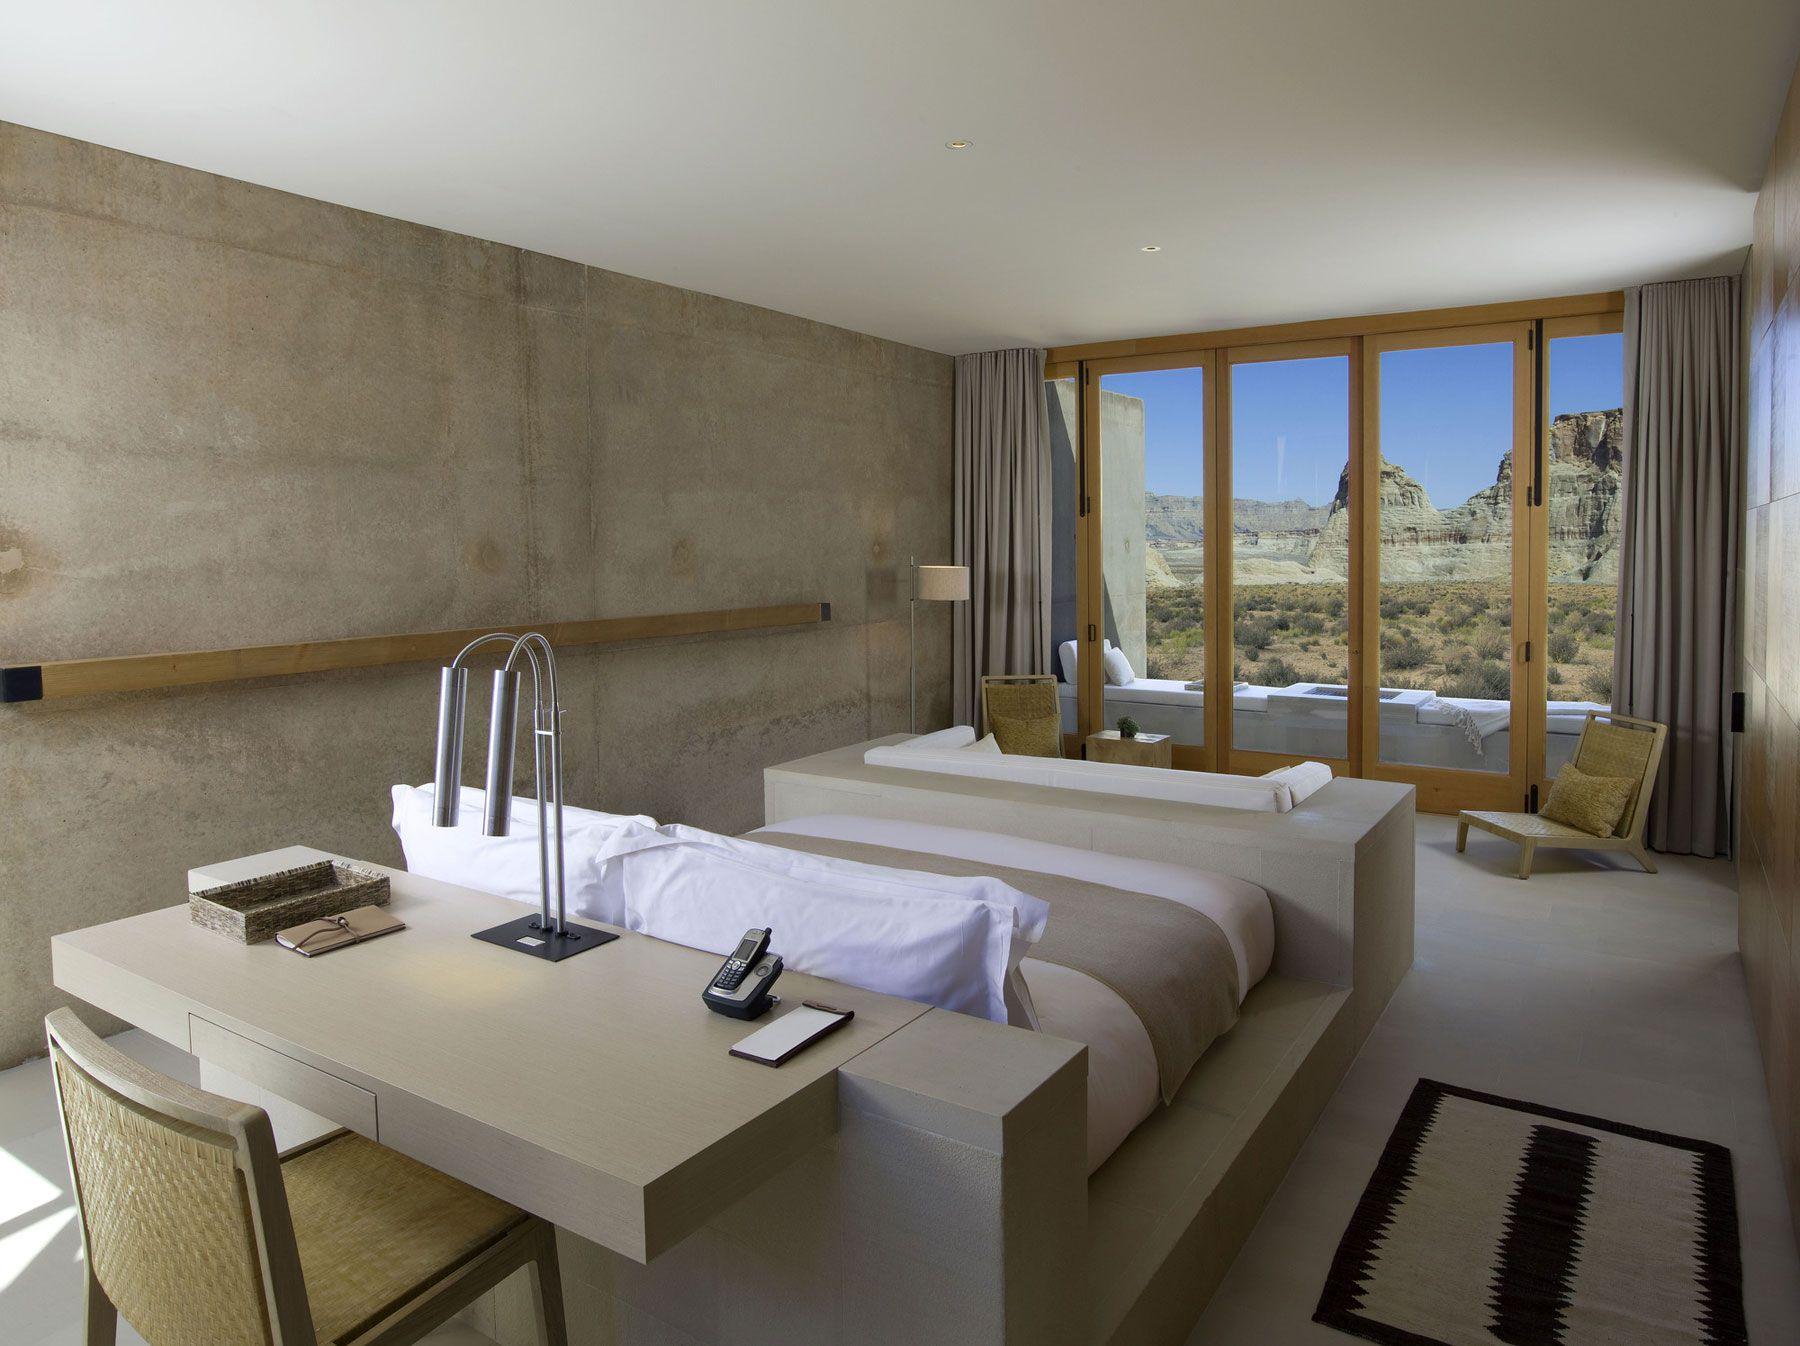 Amangiri-Luxury-Resort-Hotel-in-Canyon-Point-08